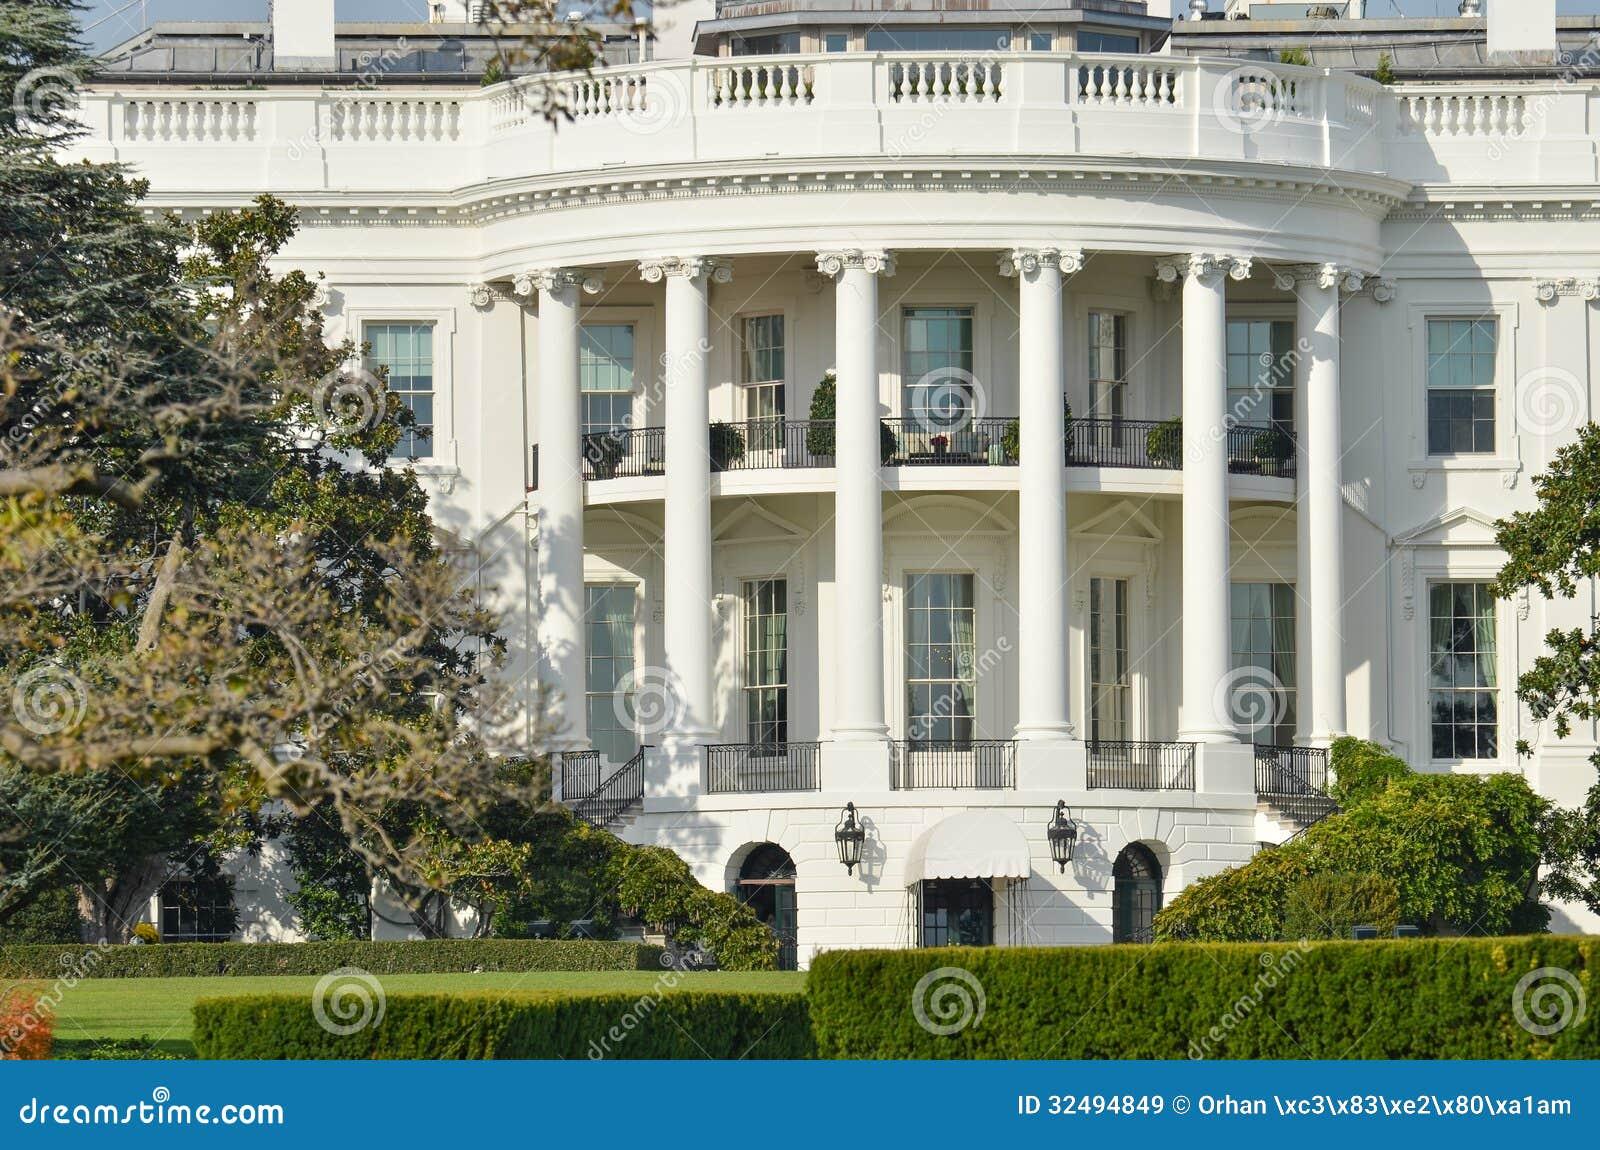 The white house washington dc united states stock image for Washington state approved house plans